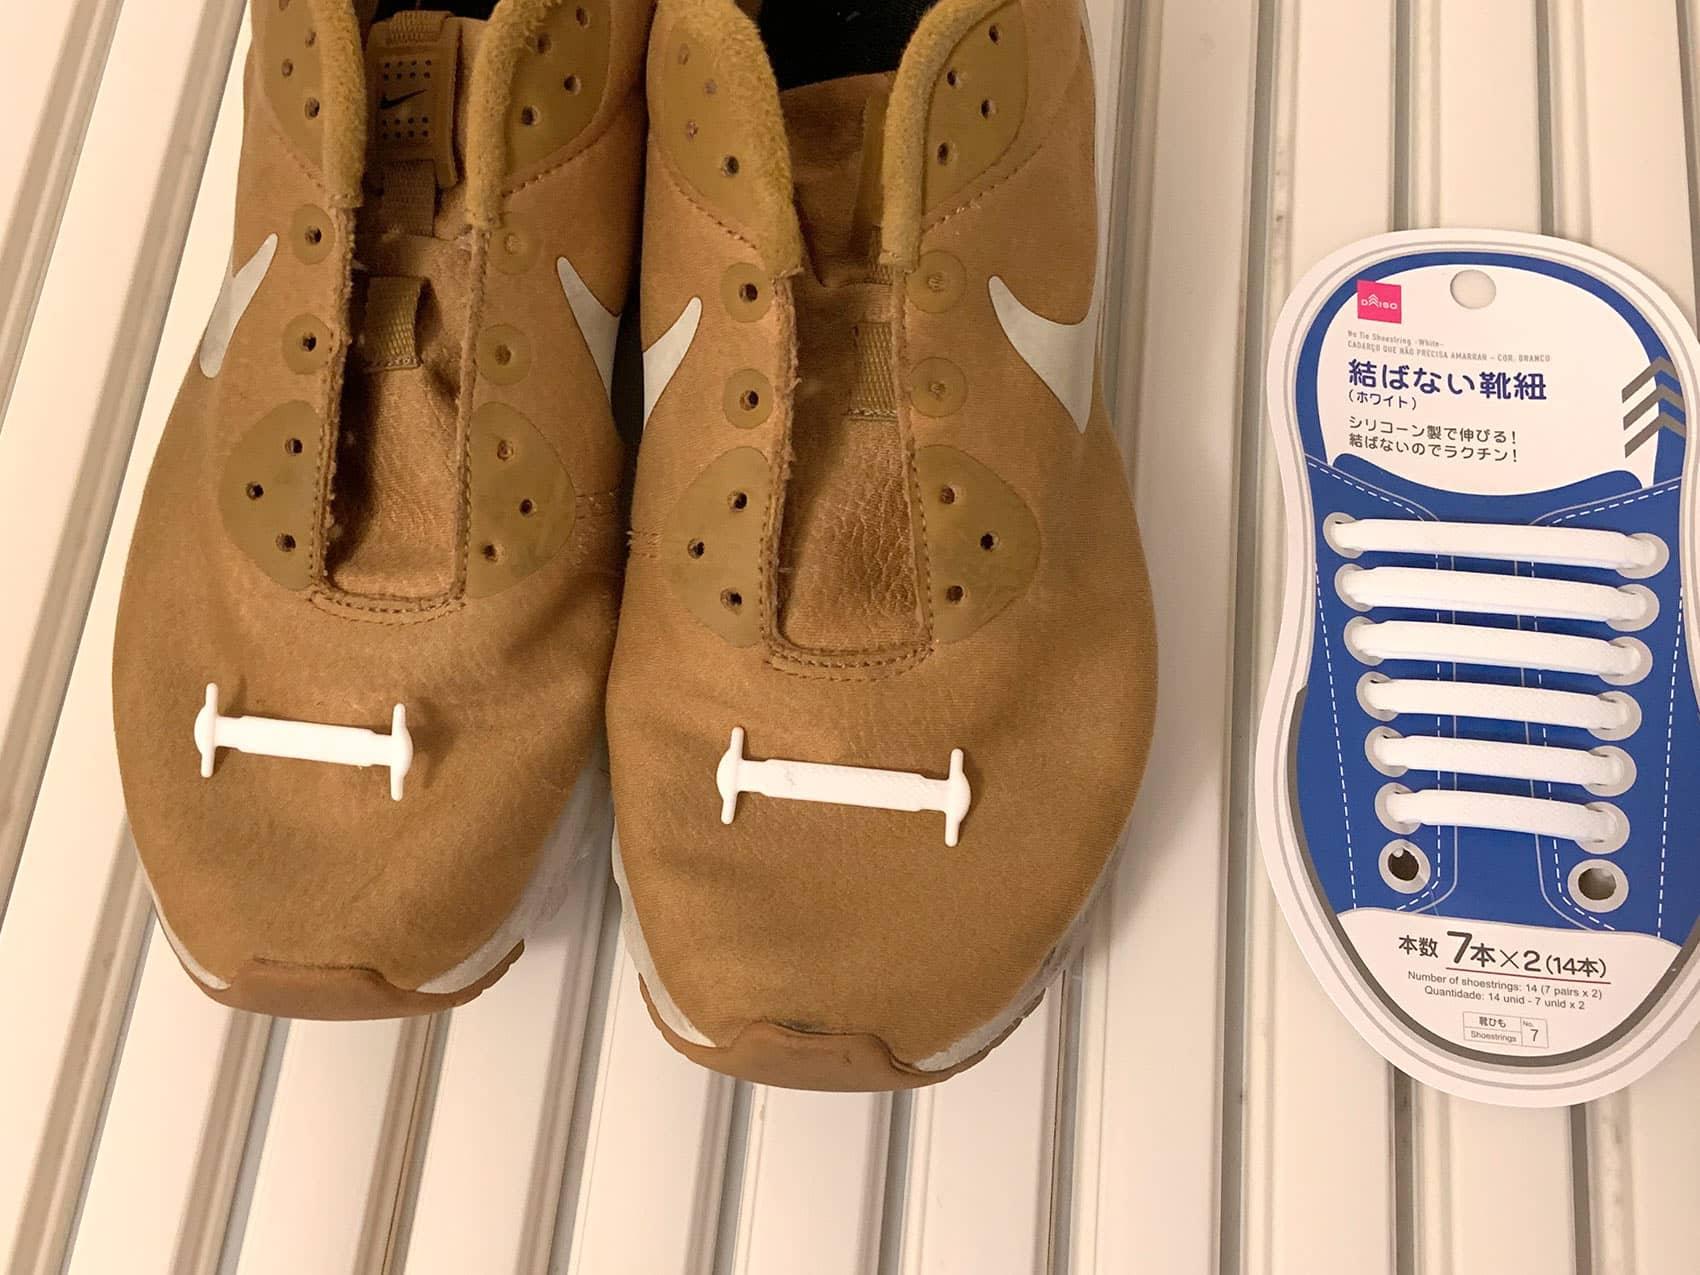 DAISO「結ばない靴紐」一本ずつ取り出してみた所